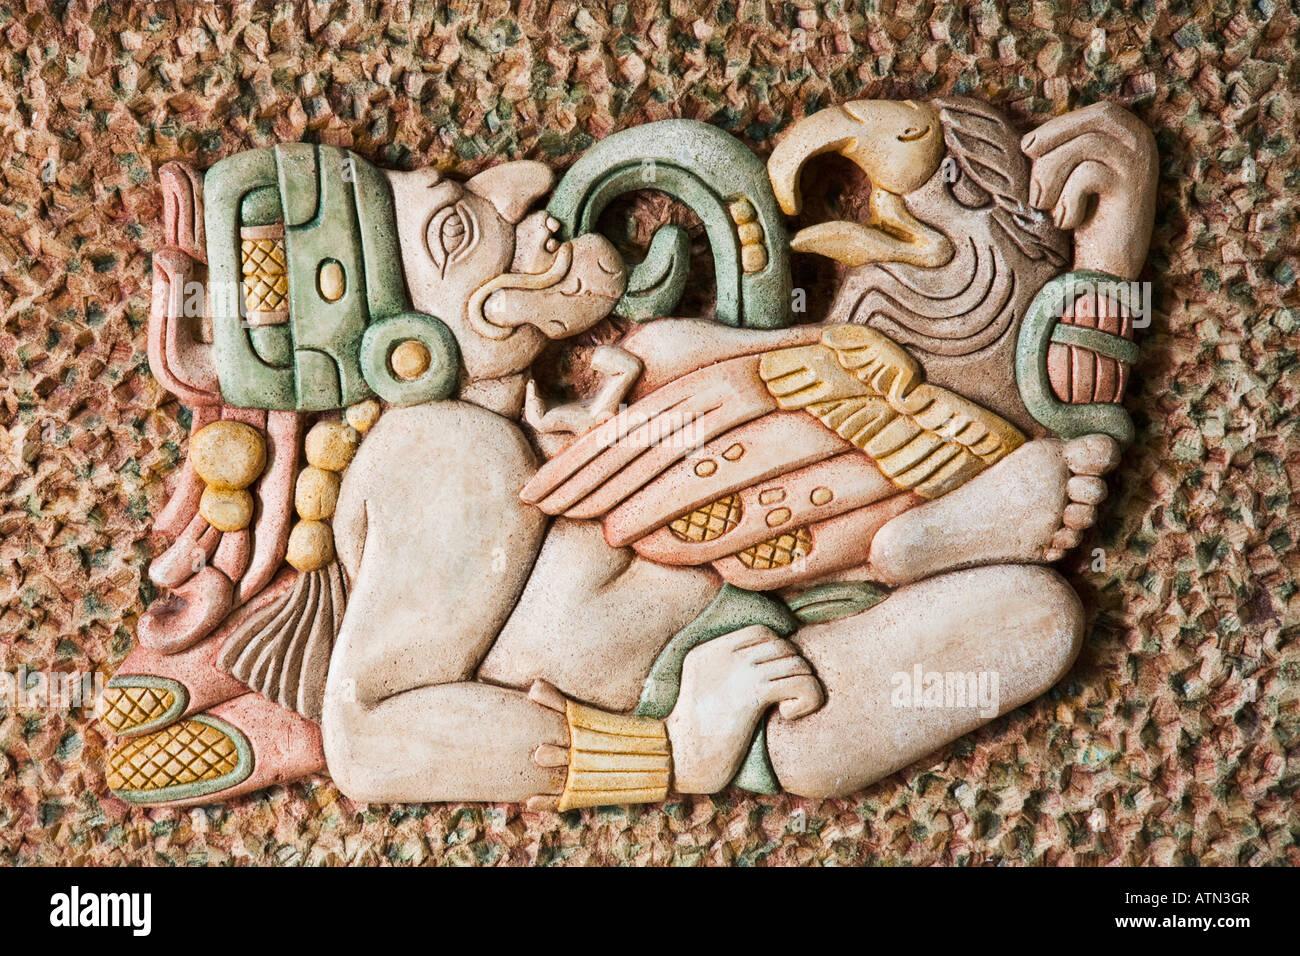 Replica Of Mayan Art In The Yucatan Peninsula Mexico